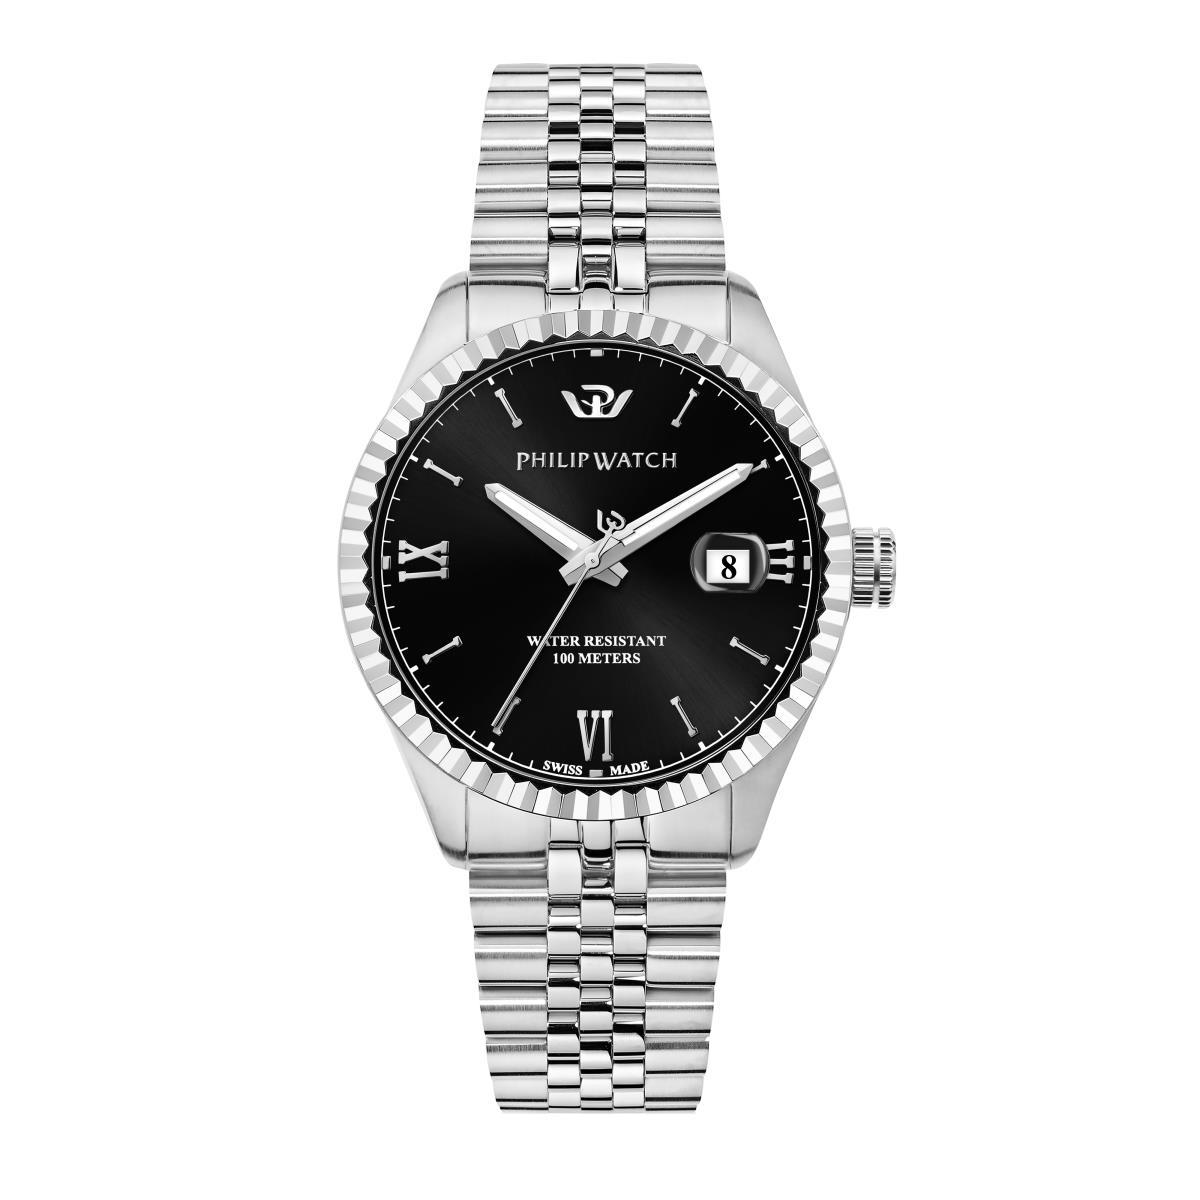 Orologio Philip Watch - Caribe Ref. R8253597058 - PHILIP WATCH